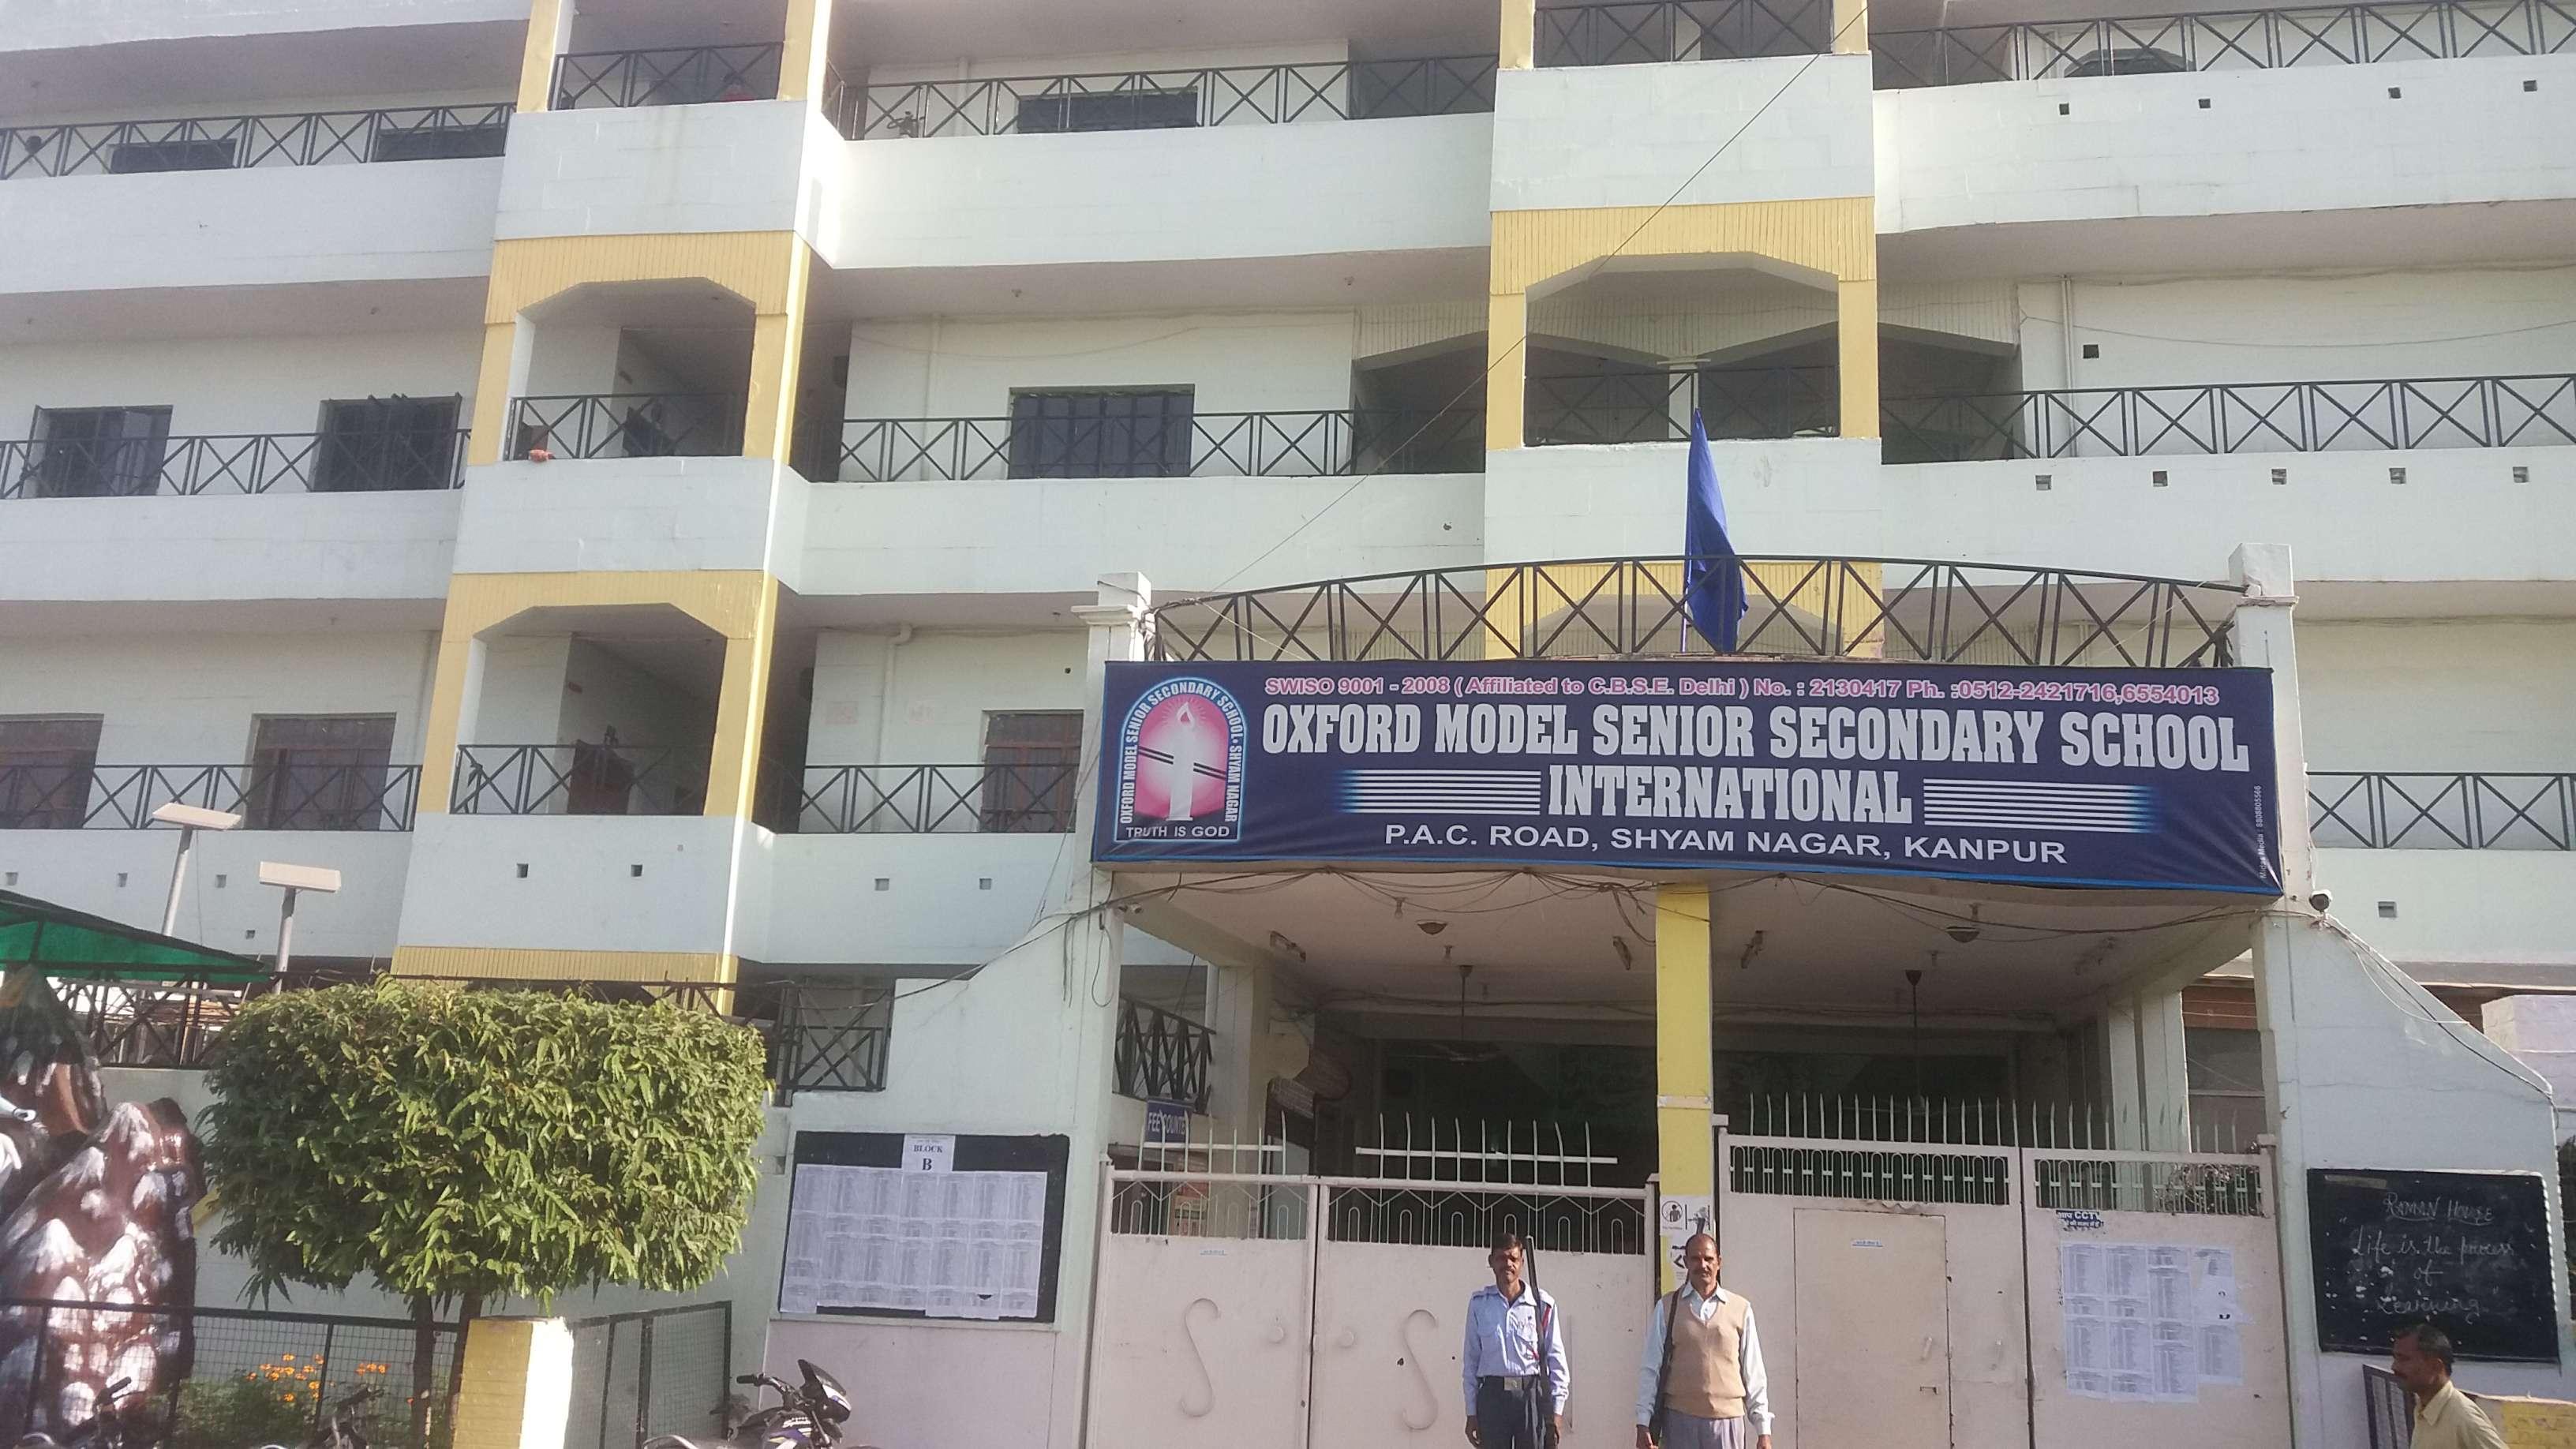 OXFORD MODEL SENIOR SECONDARY SCHOOL 147 E SHYAM NAGAR KANPUR UTTAR PRADESH 2130417